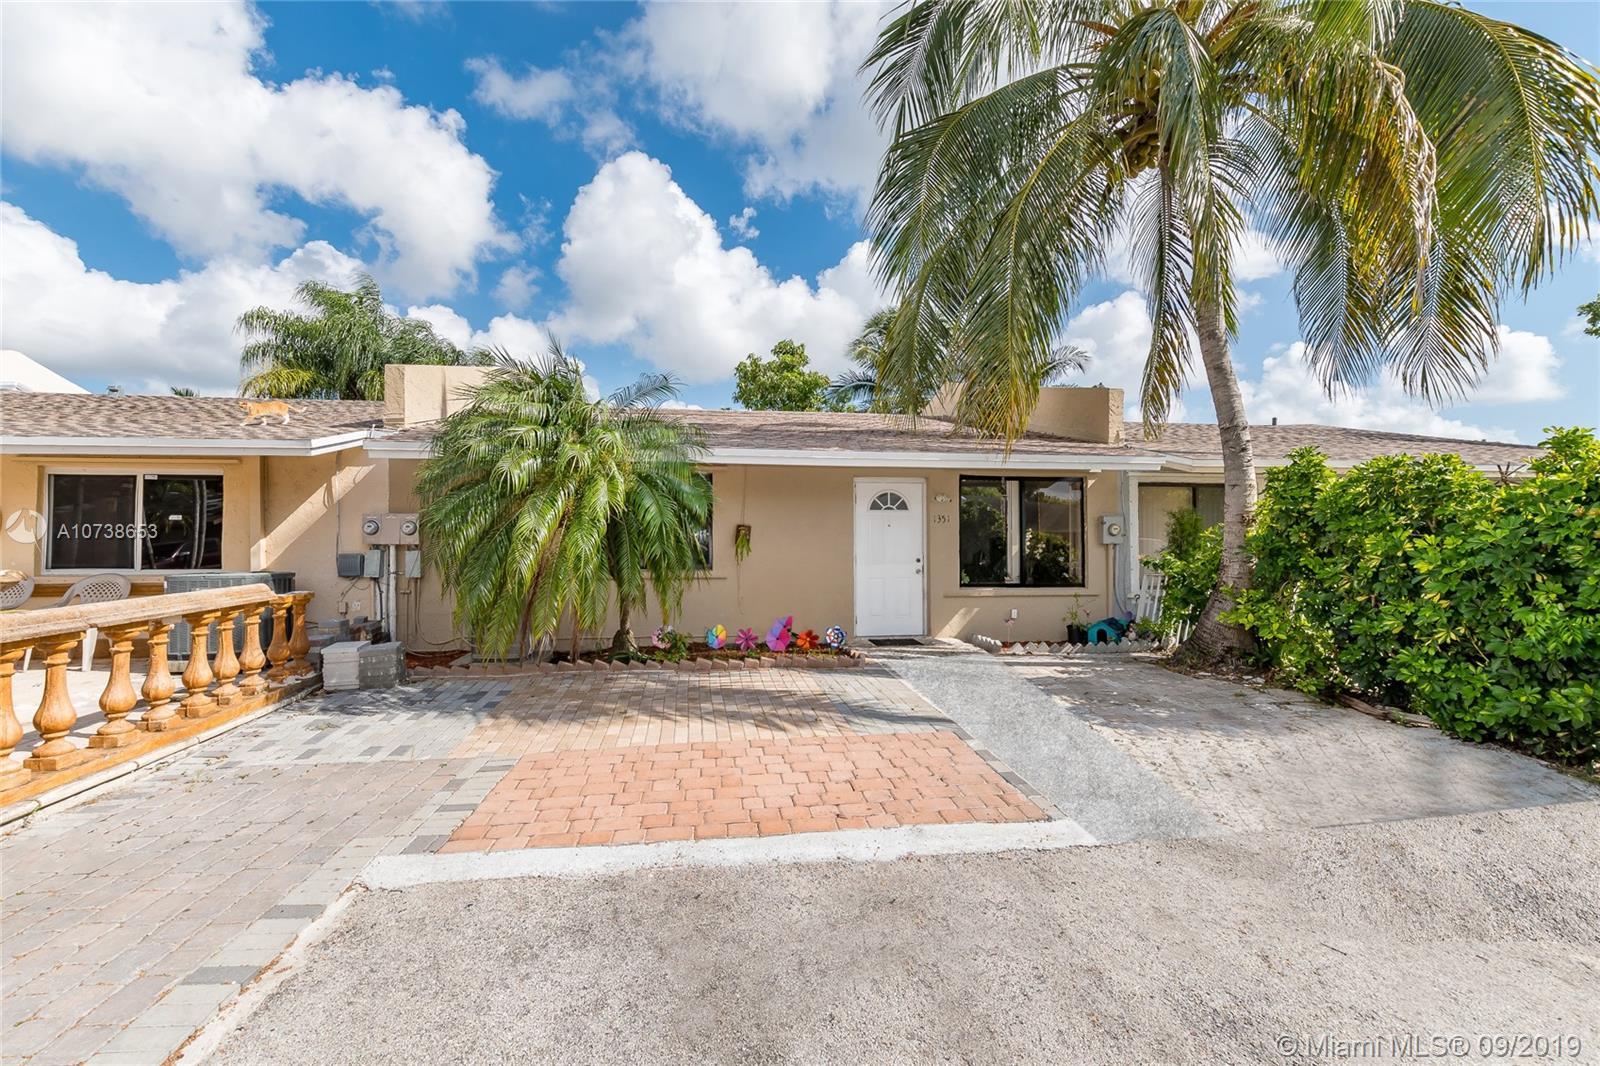 1351 Kia Dr, Homestead, FL 33033 - Homestead, FL real estate listing